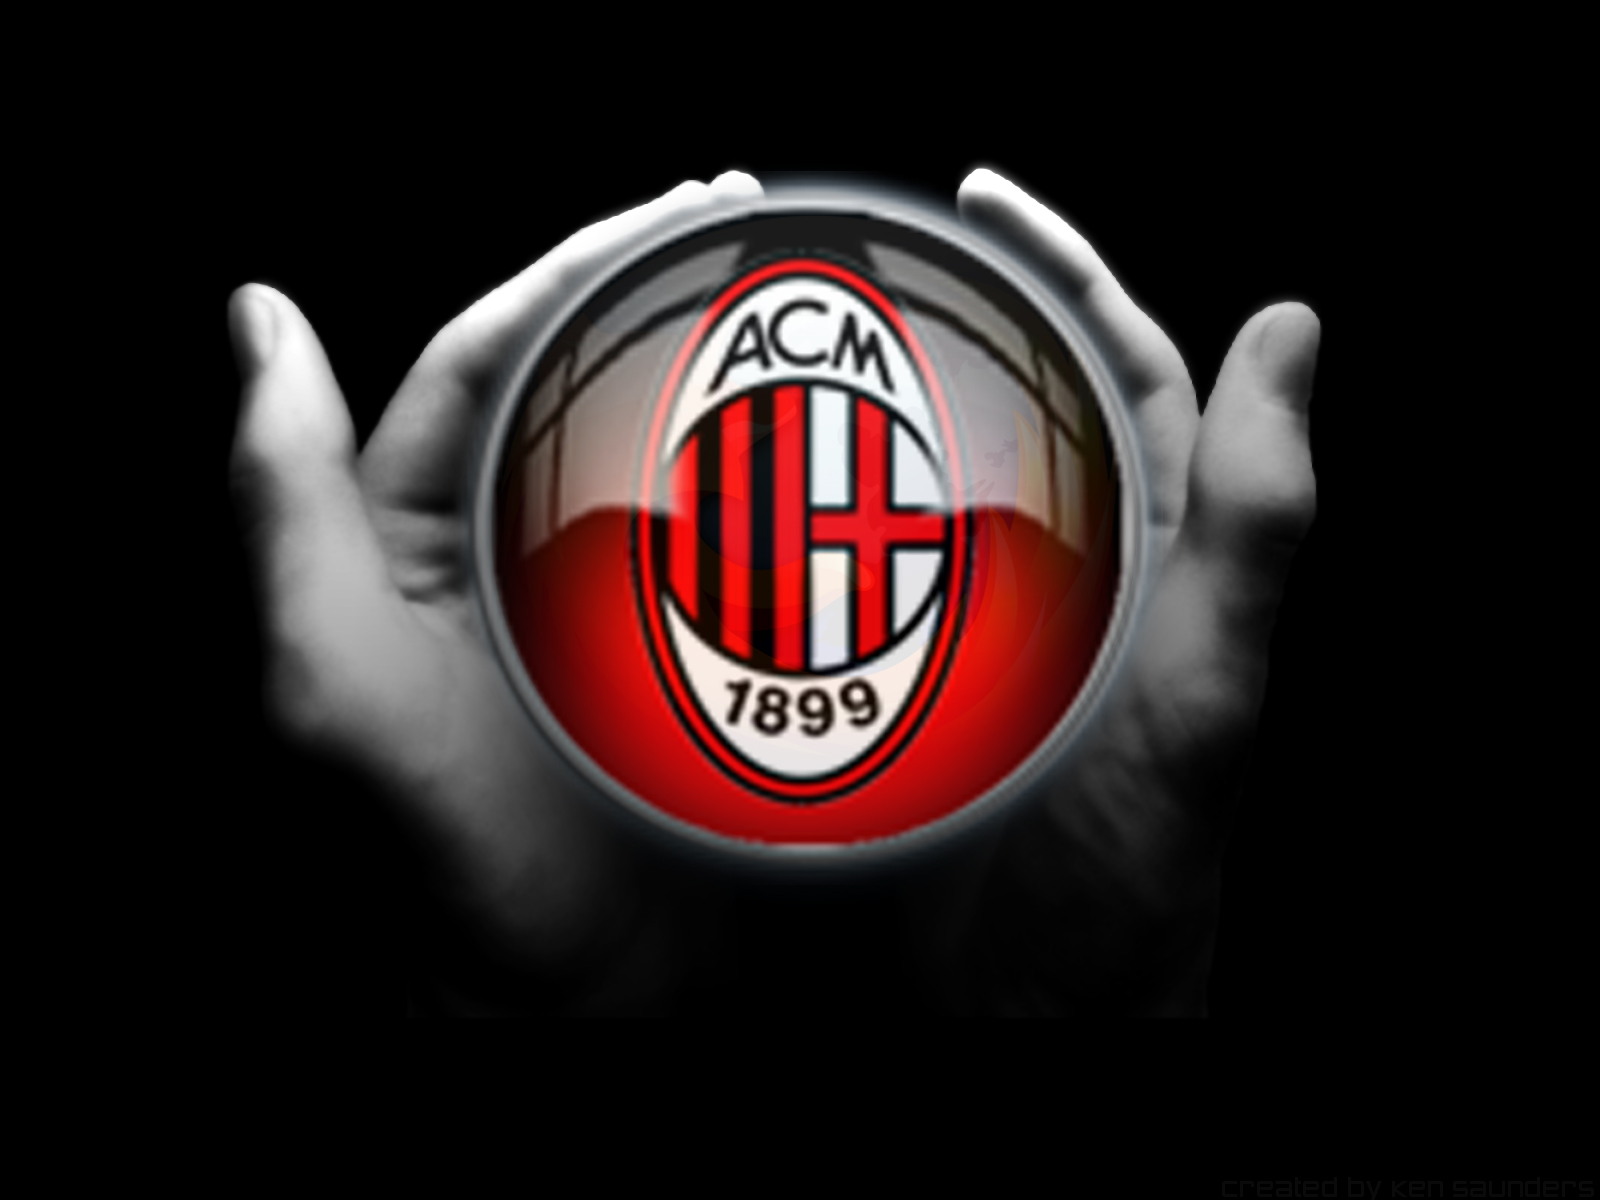 AC Milan on Hands 1600x1200